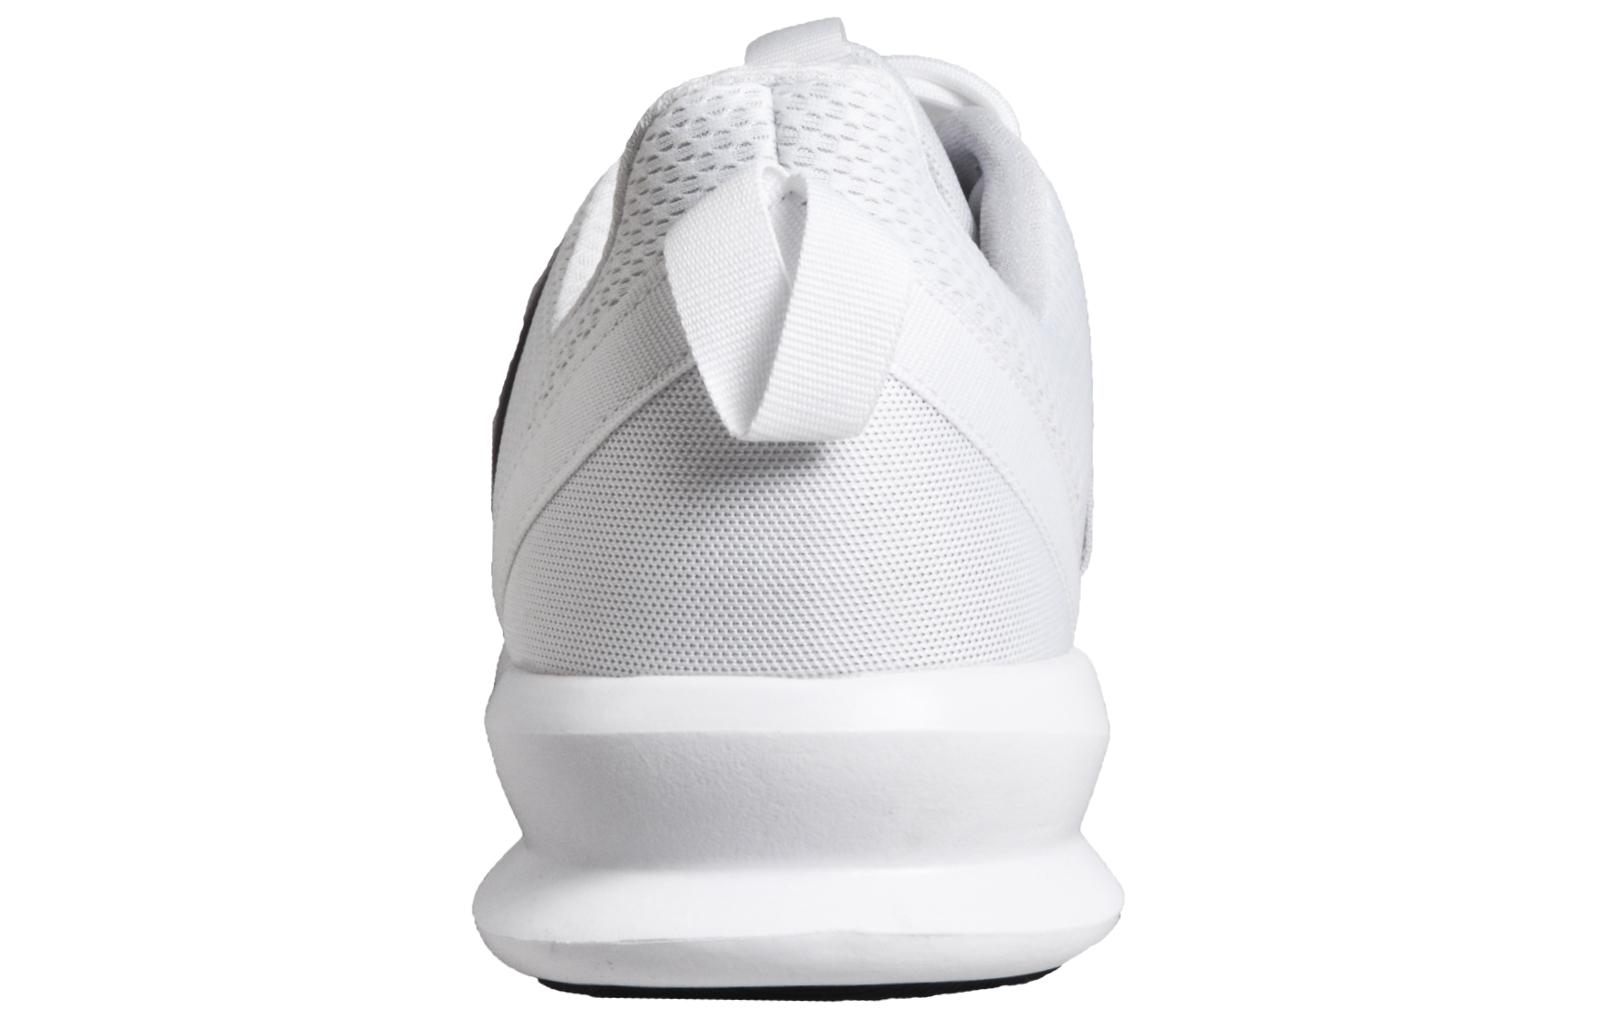 online store c22e4 4dc60 Adidas Originals Loop Racer Men s Classic Causal Fashion Trainers White